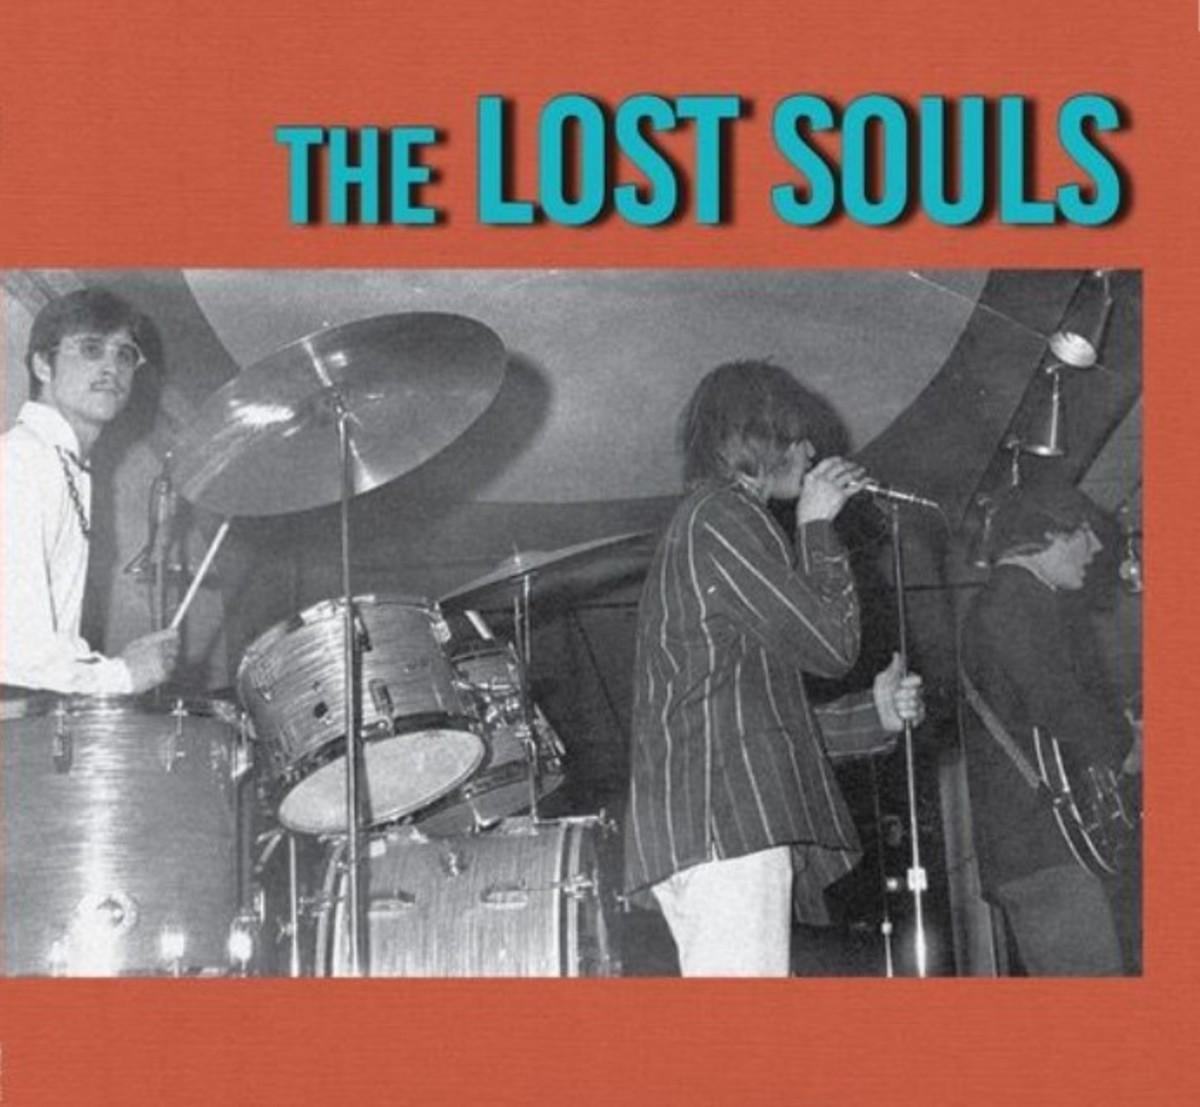 Choir Lost Souls